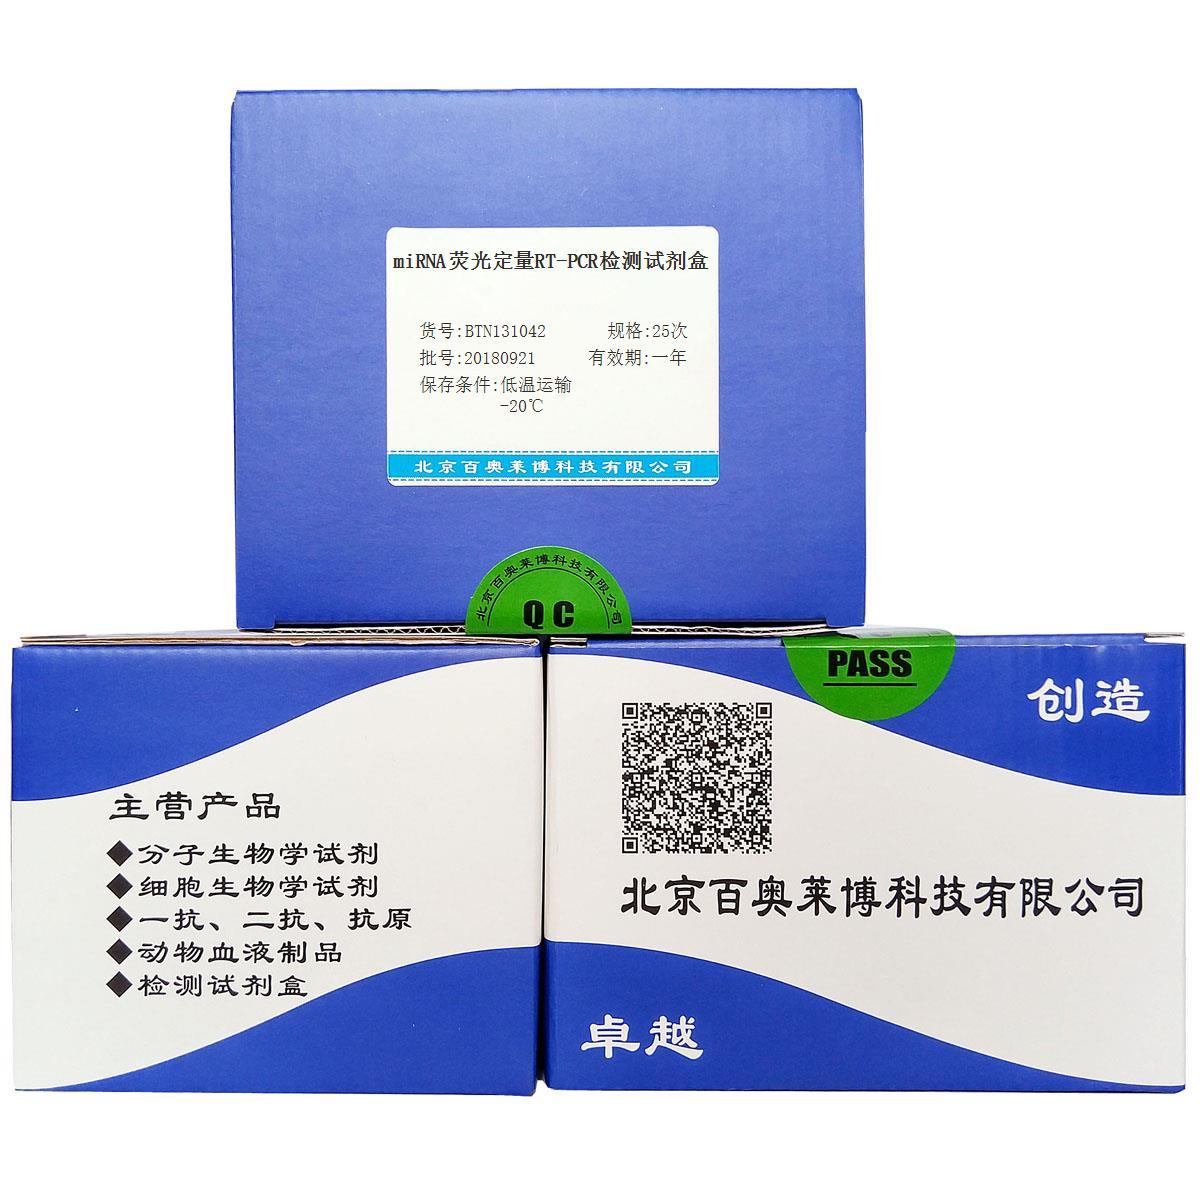 miRNA荧光定量RT-PCR检测试剂盒